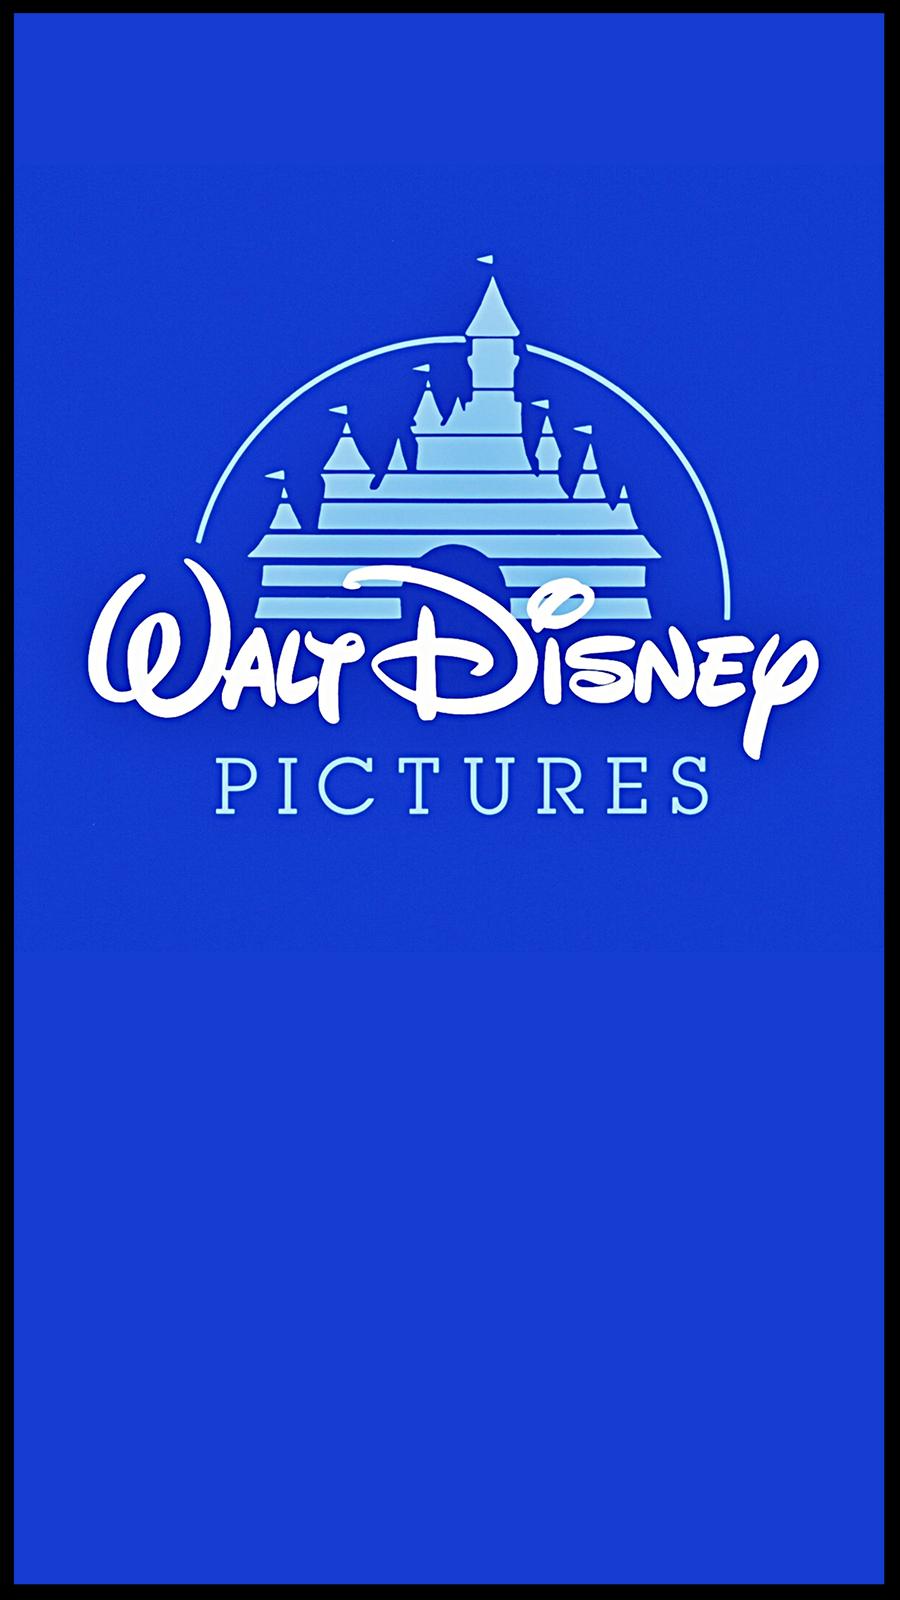 DisneyOld16X9.png